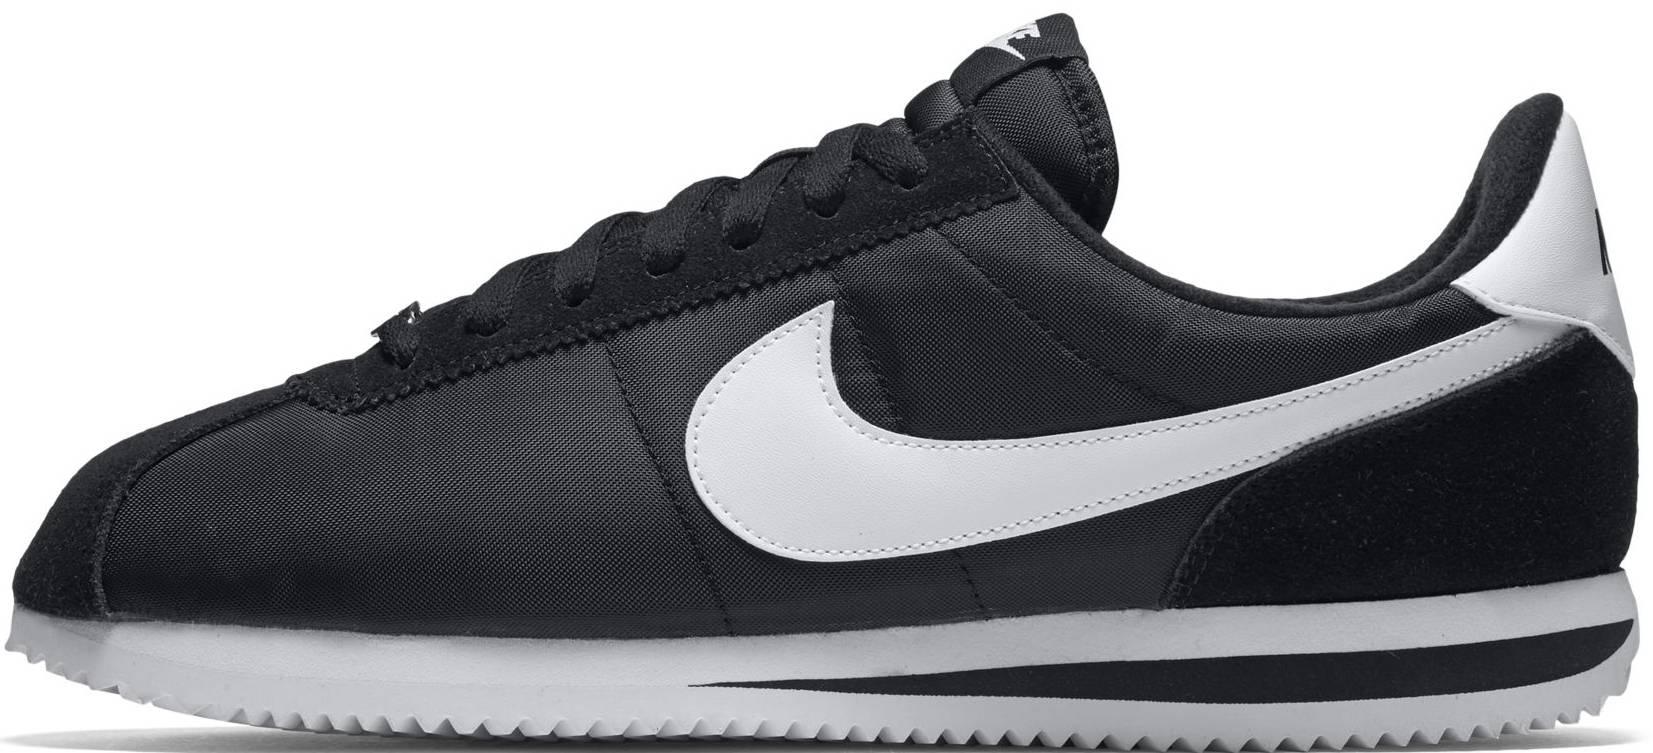 Golpeteo Desarrollar crecimiento  Nike Cortez Basic Nylon sneakers in 5 colors | RunRepeat